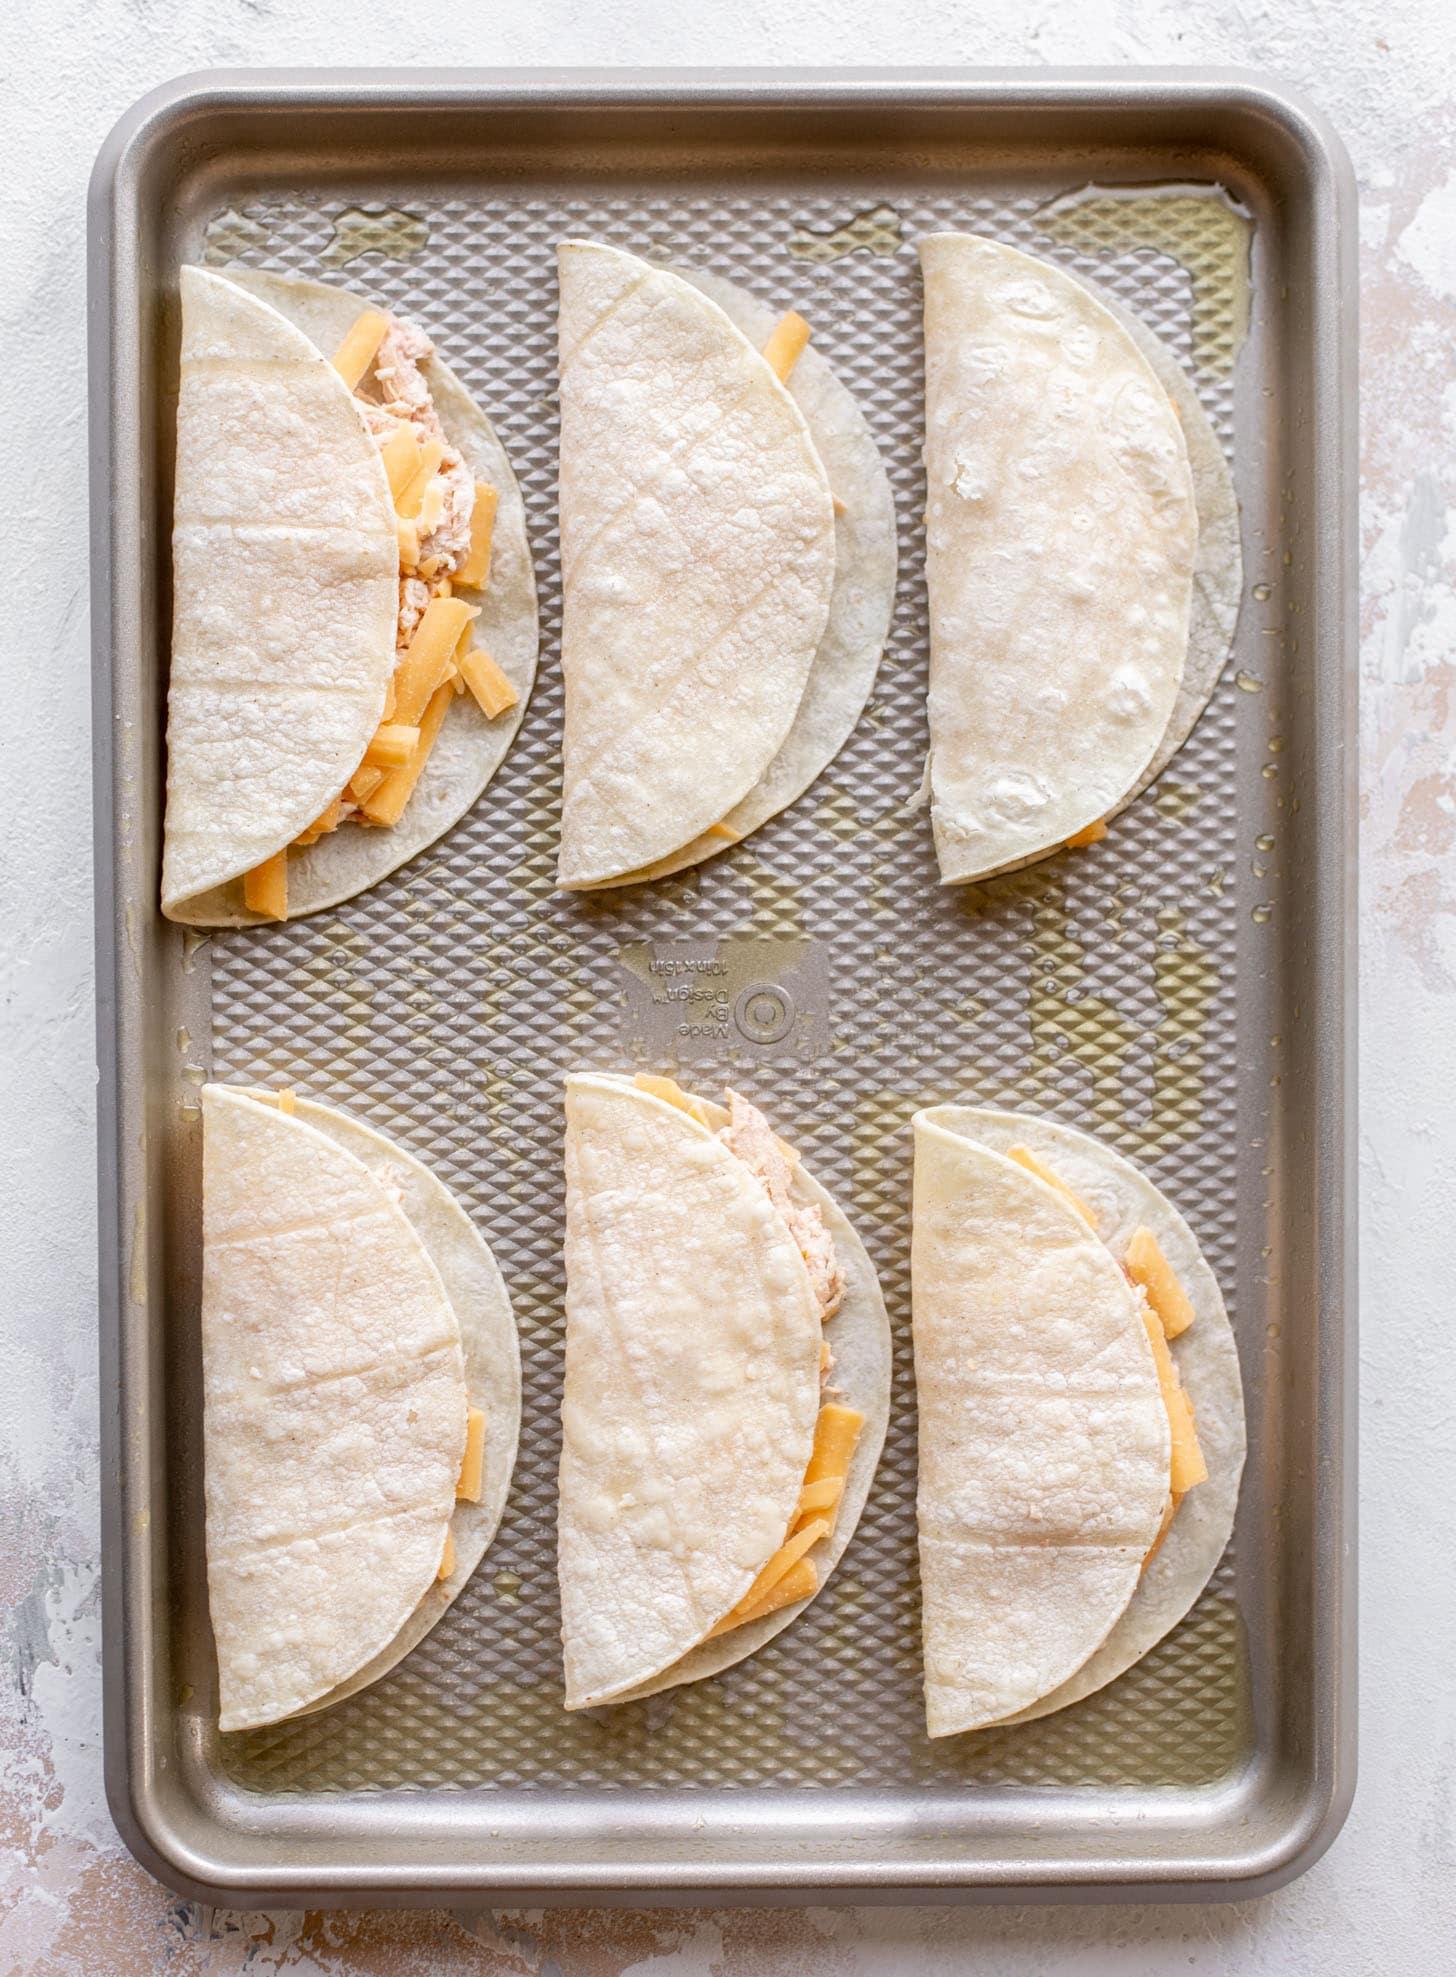 tortillas with salsa chicken filling